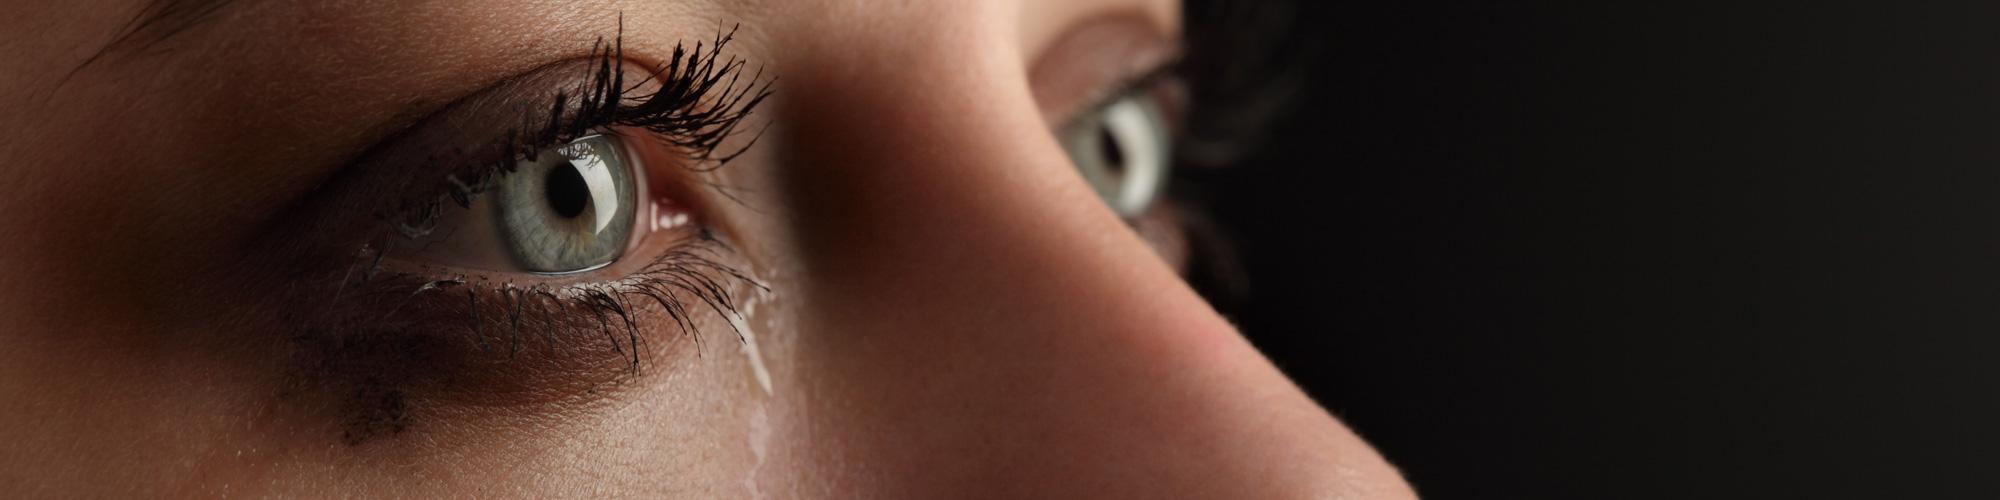 krise-mistrivsel-moenster-har-det-dårligt-psykoterapi-vivi-hinirchs-aarhus